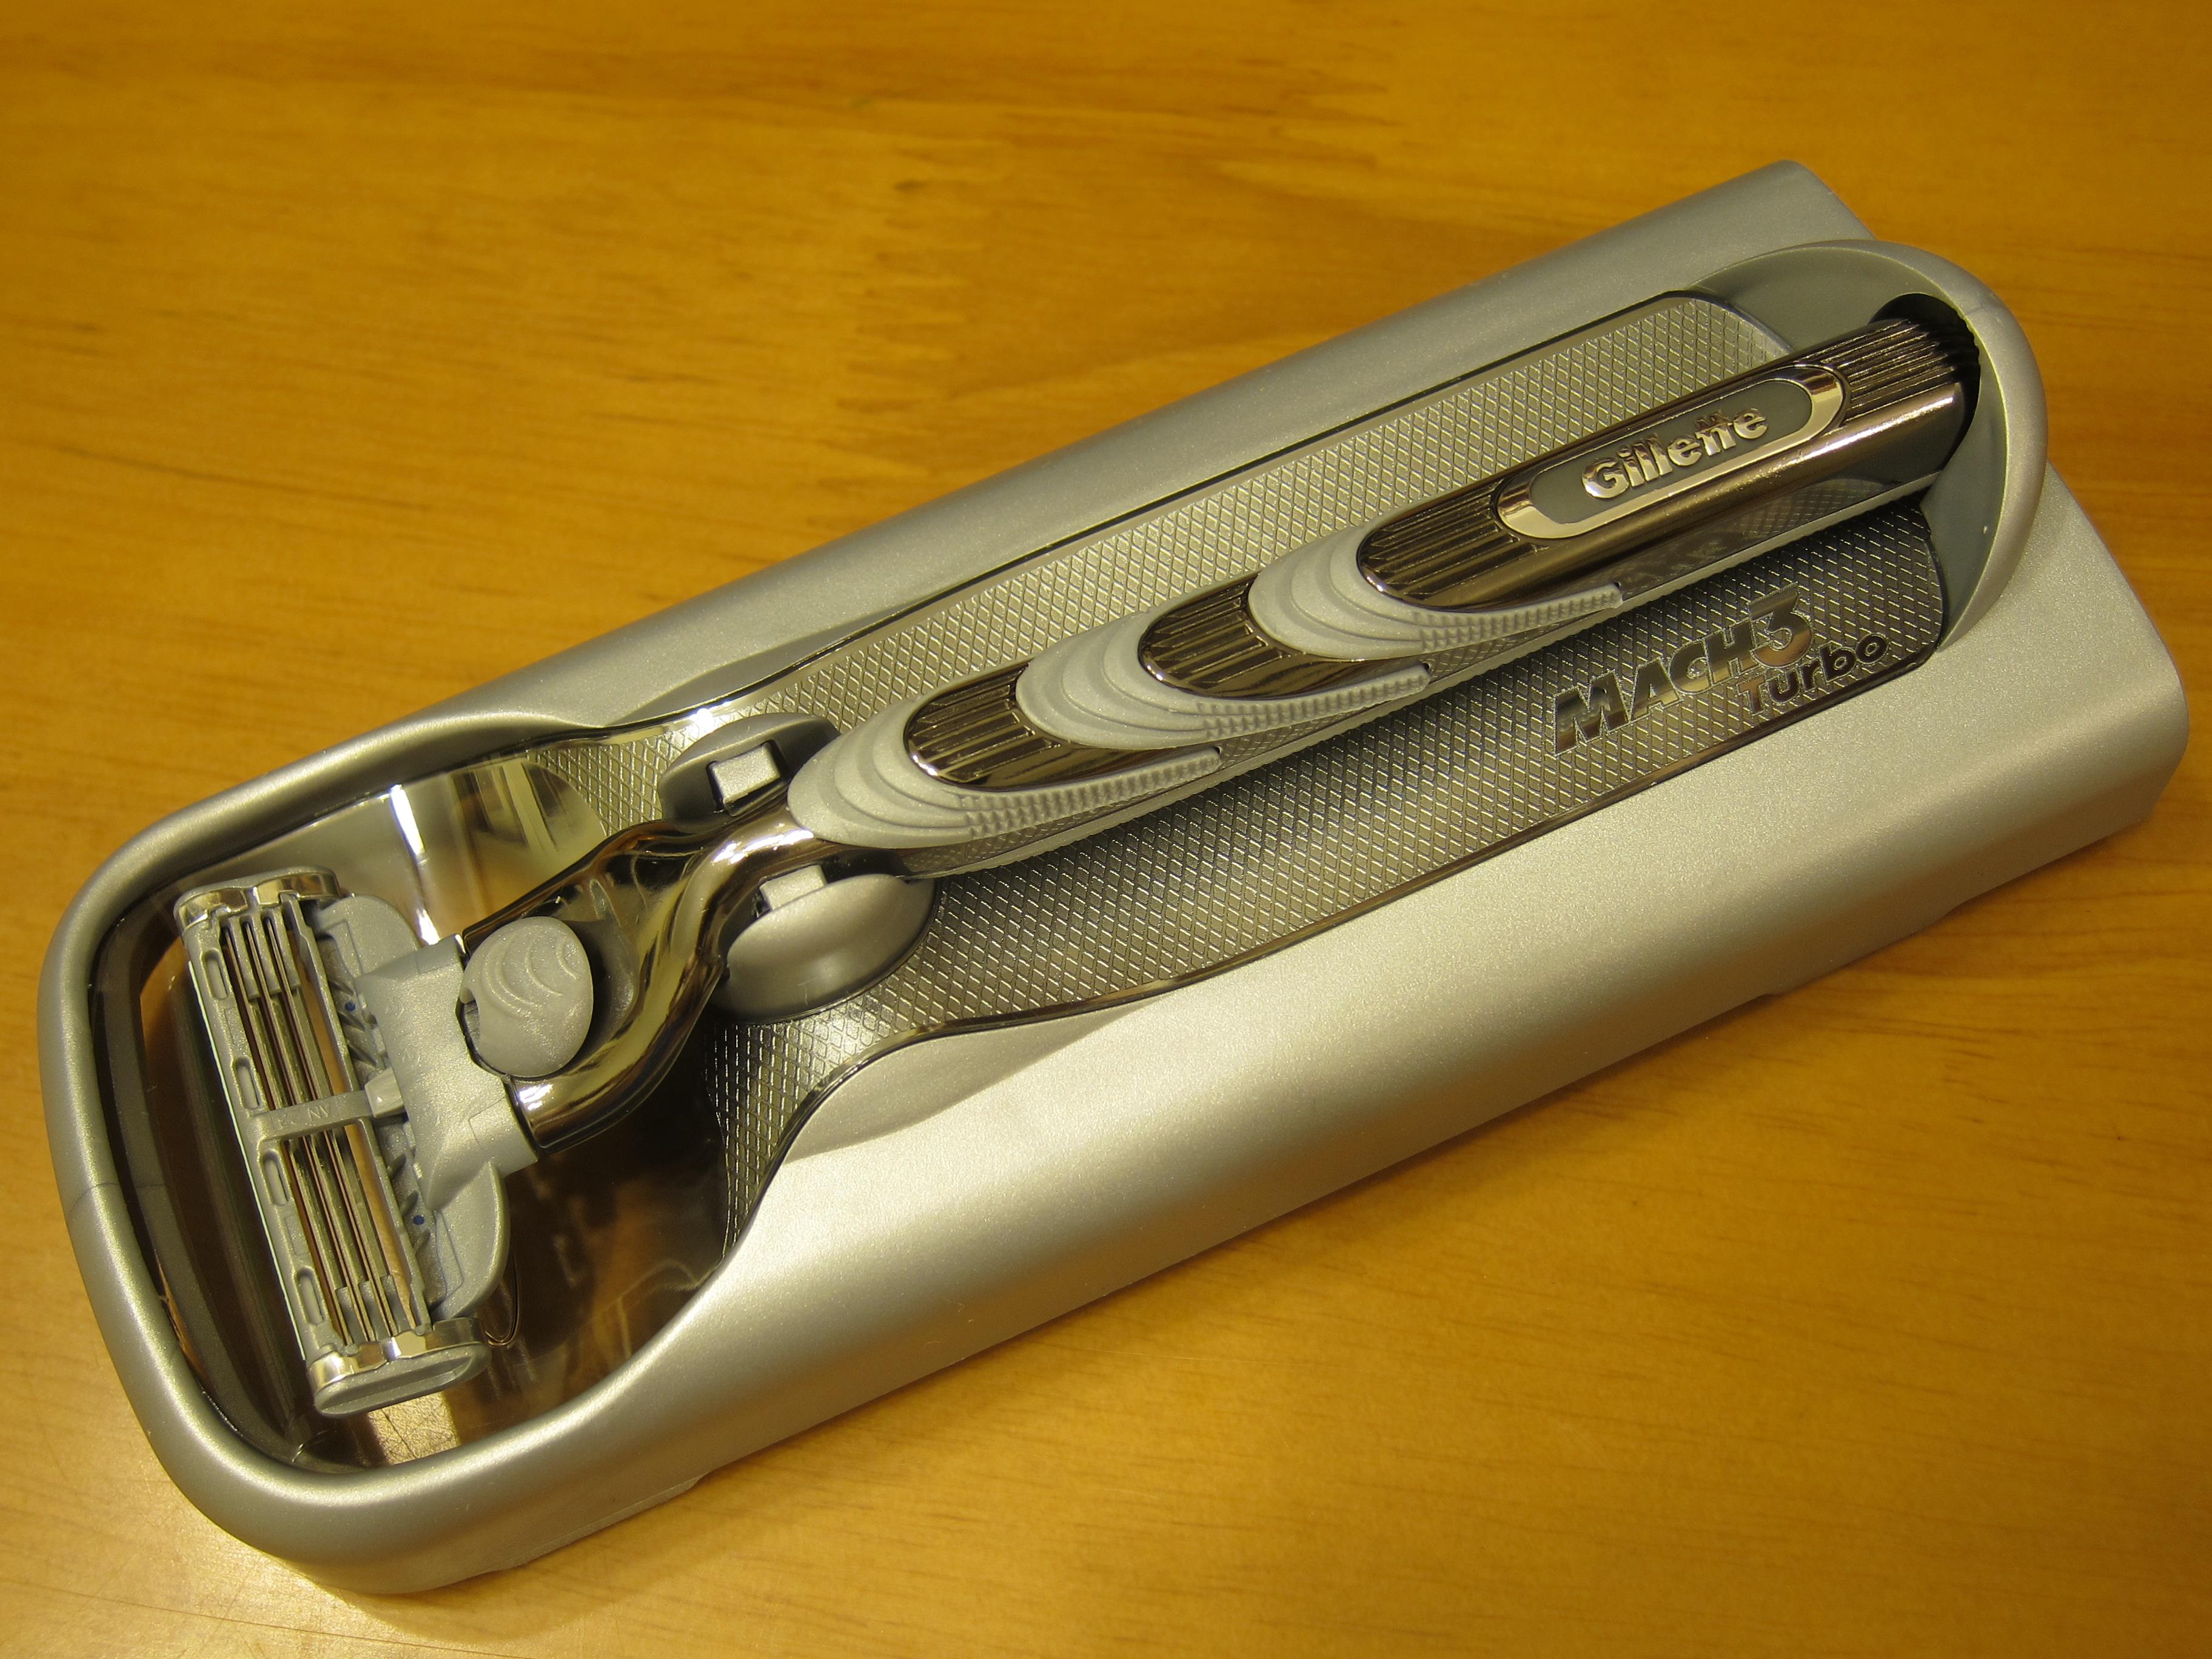 File:Gillette Mach3 Turbo.jpg - Wikimedia Commons